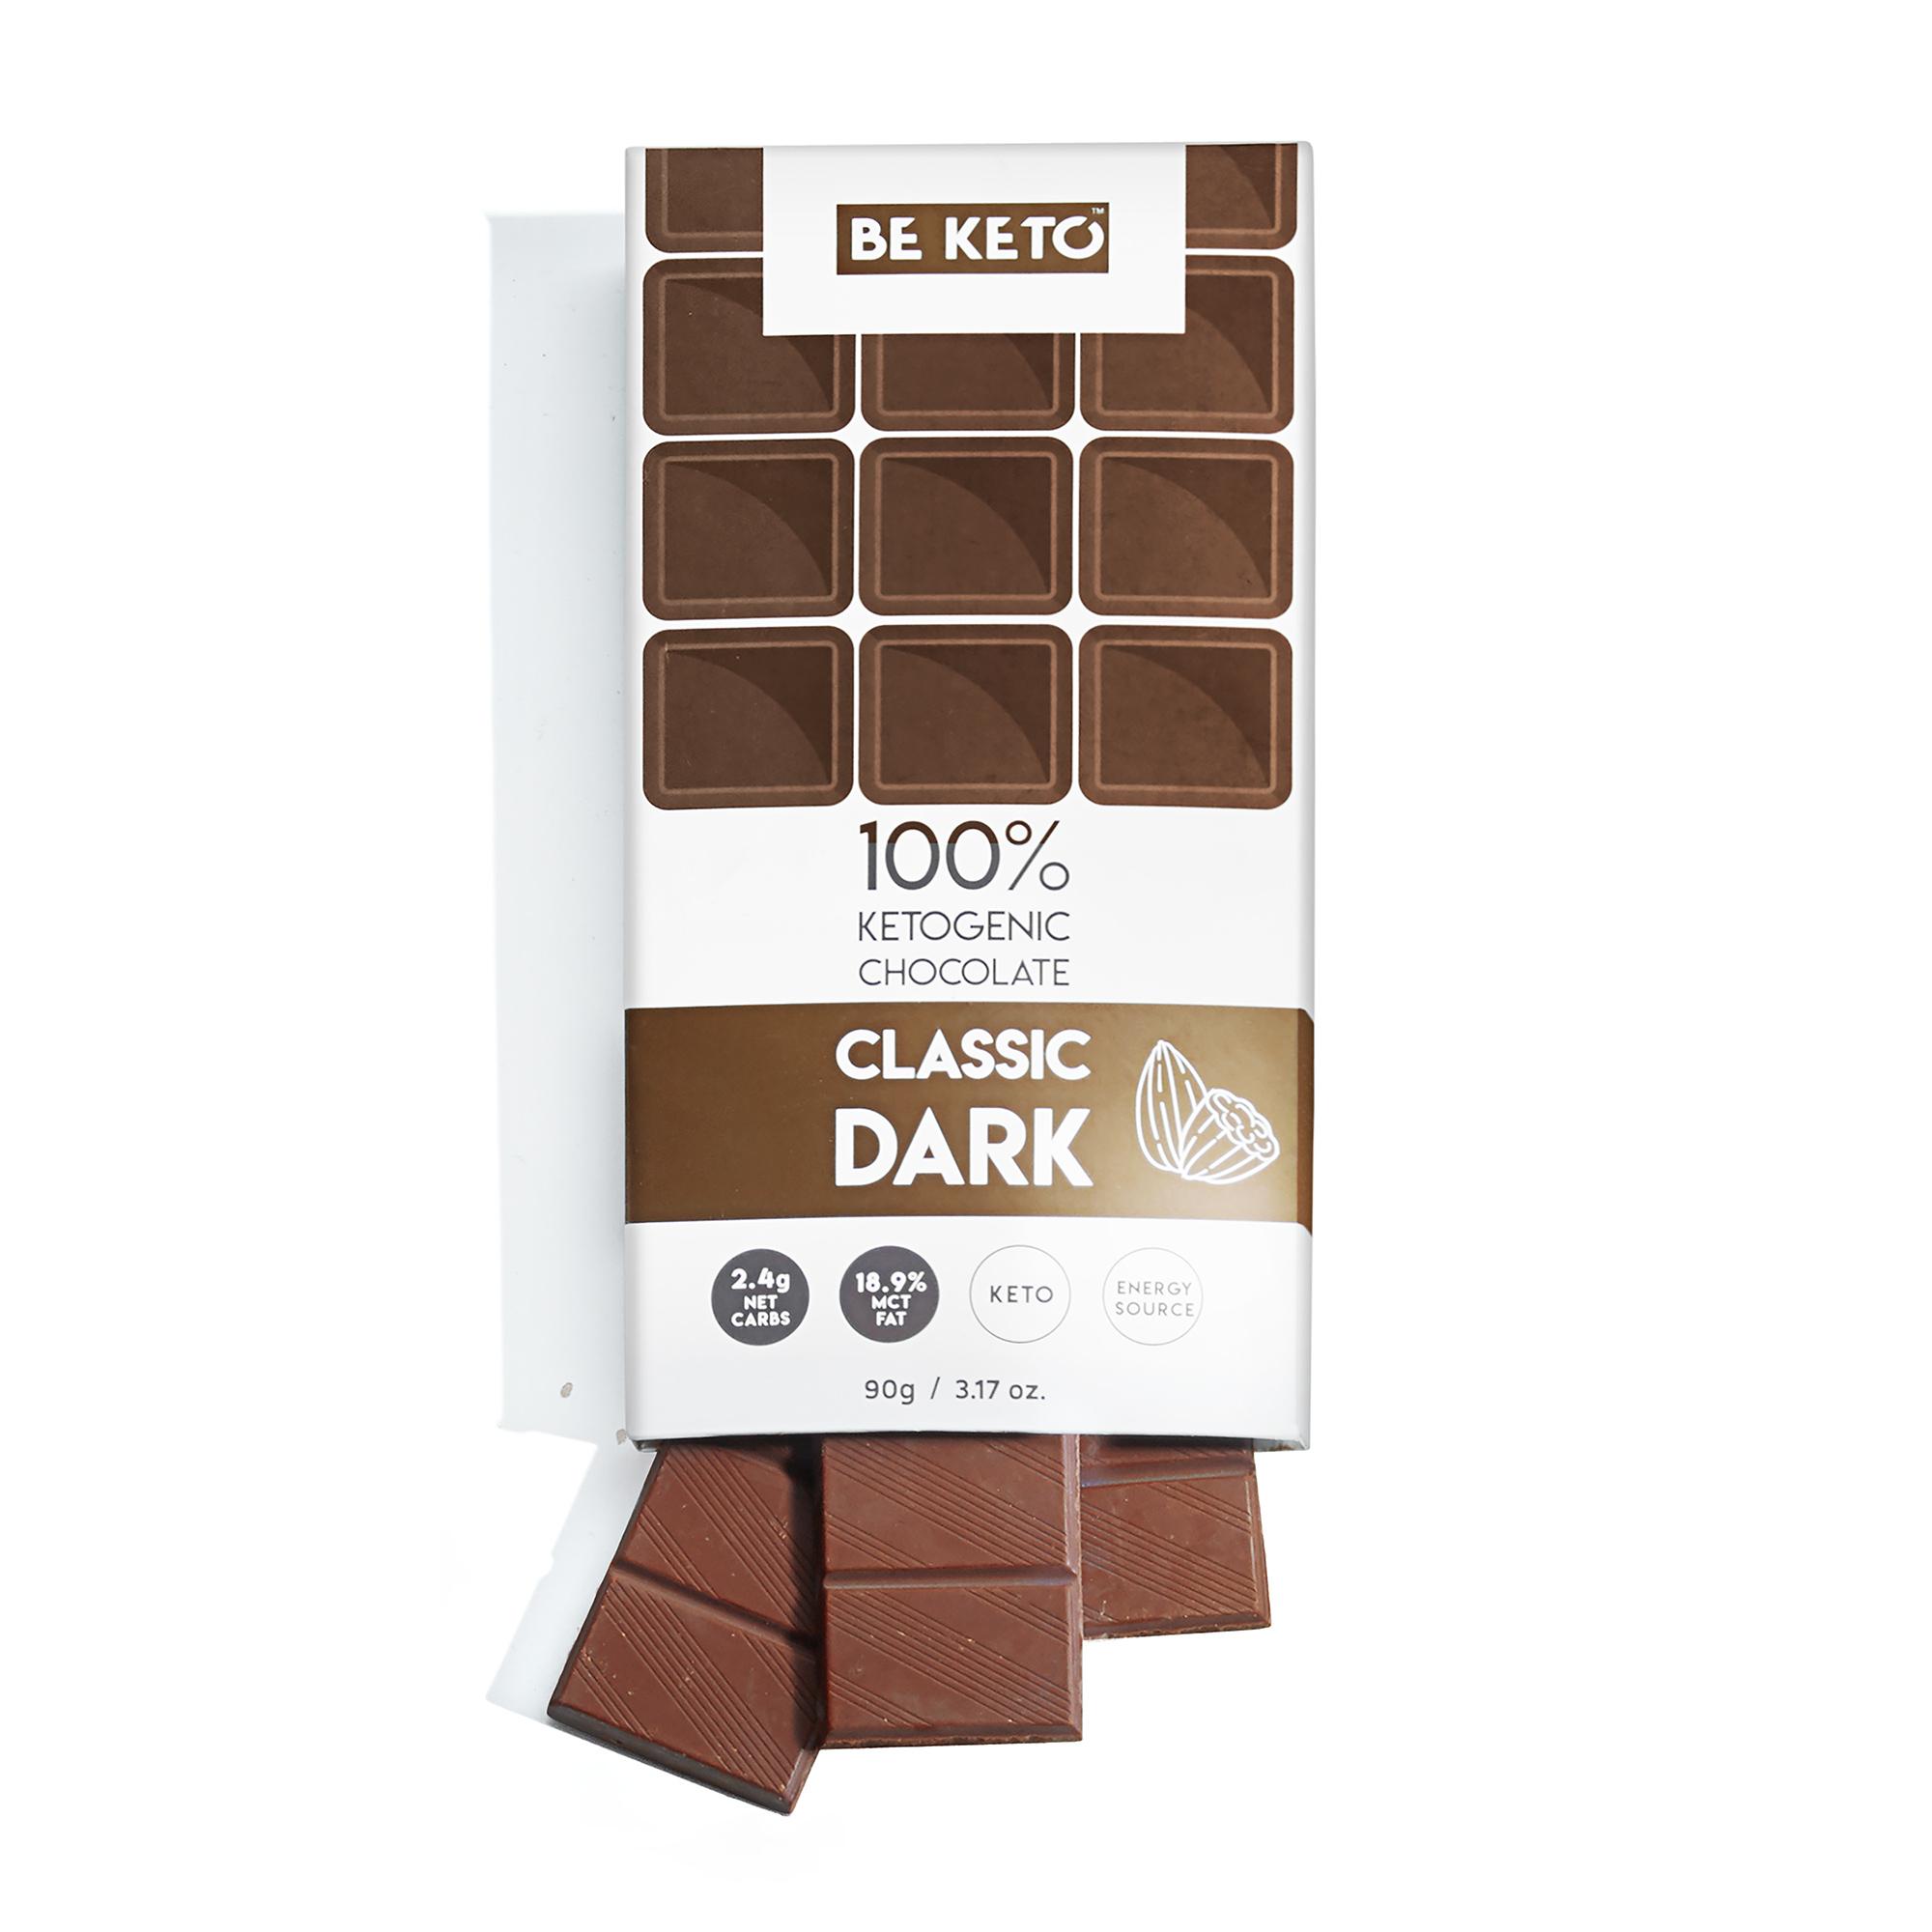 Keto Chocolate + MCT Oil - Classic Dark